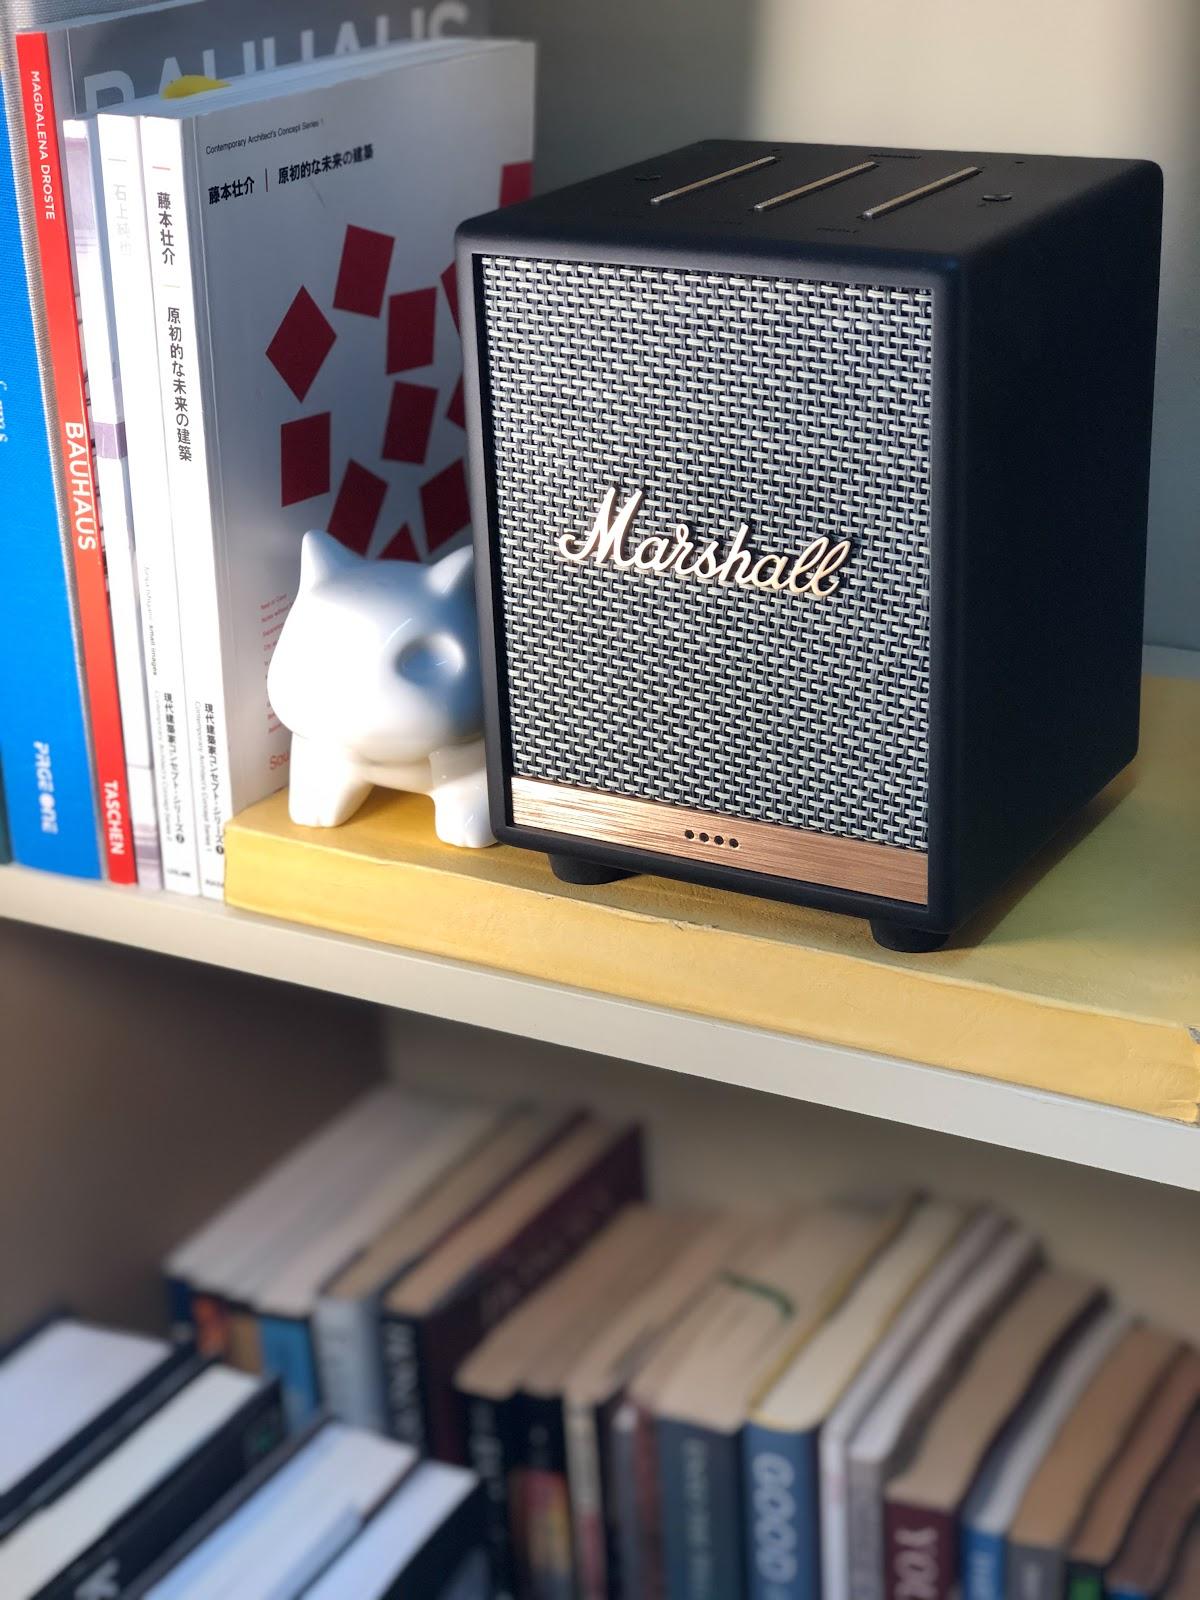 Marshall Uxbridge Voice on a bookshelf